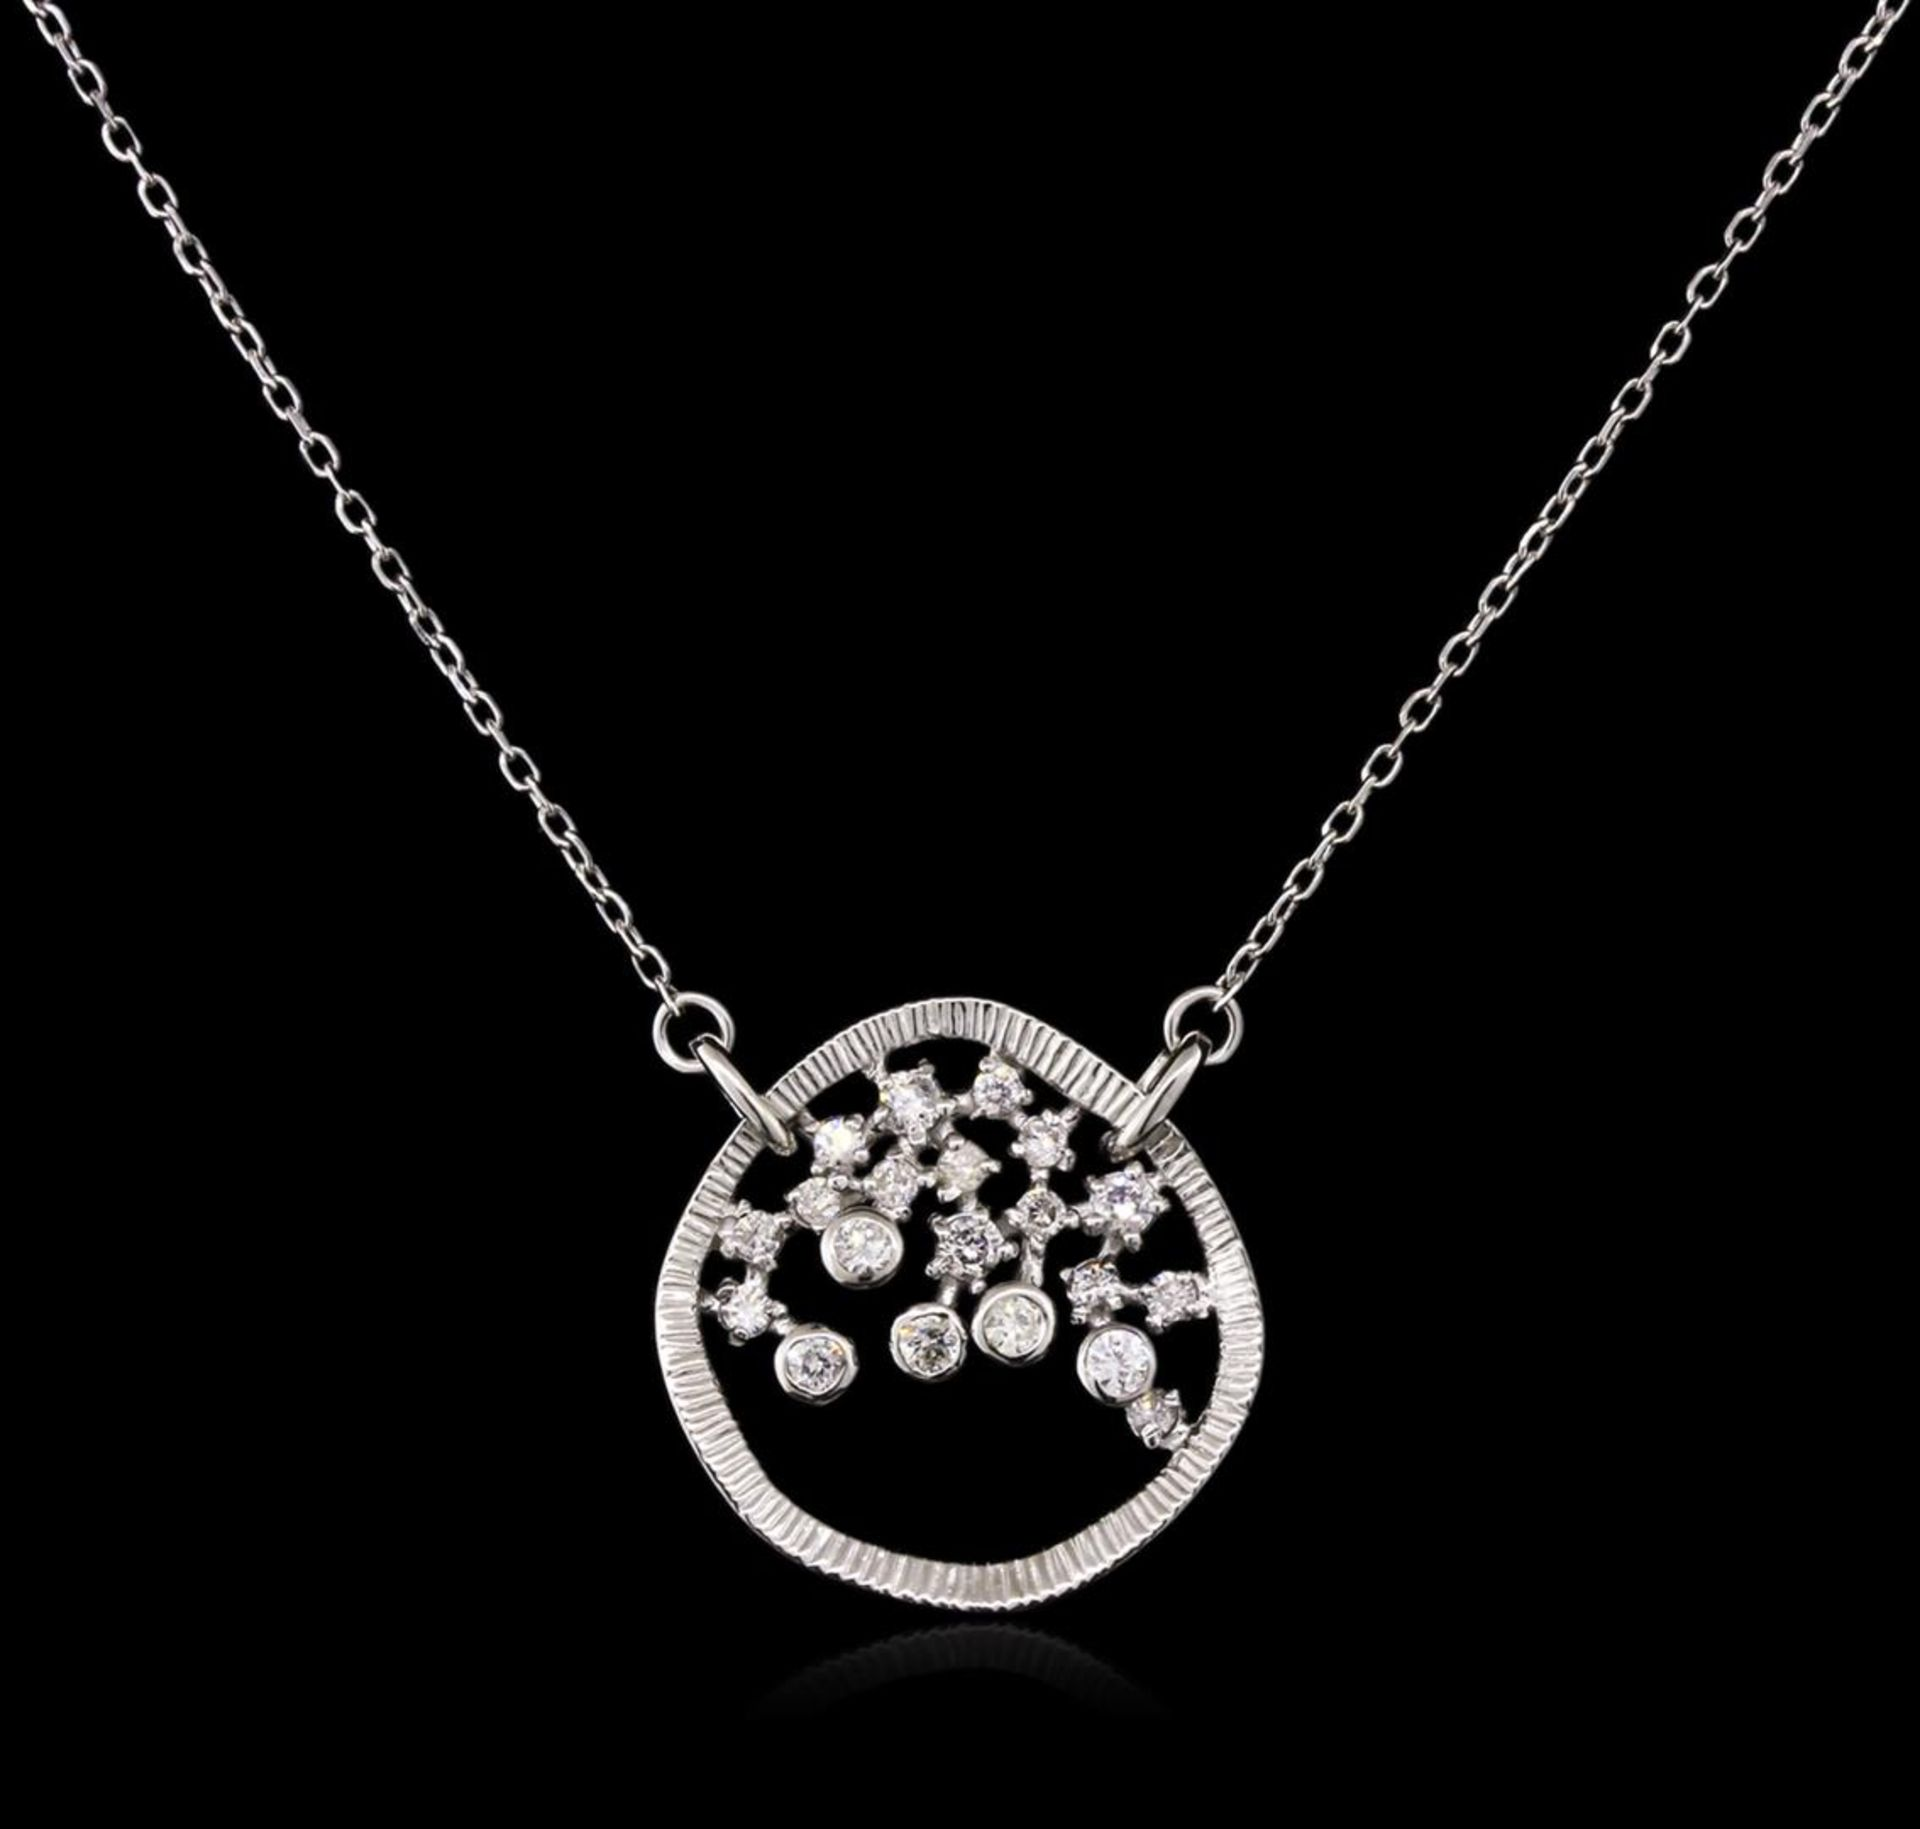 0.34 ctw Diamond Necklace - 14KT White Gold